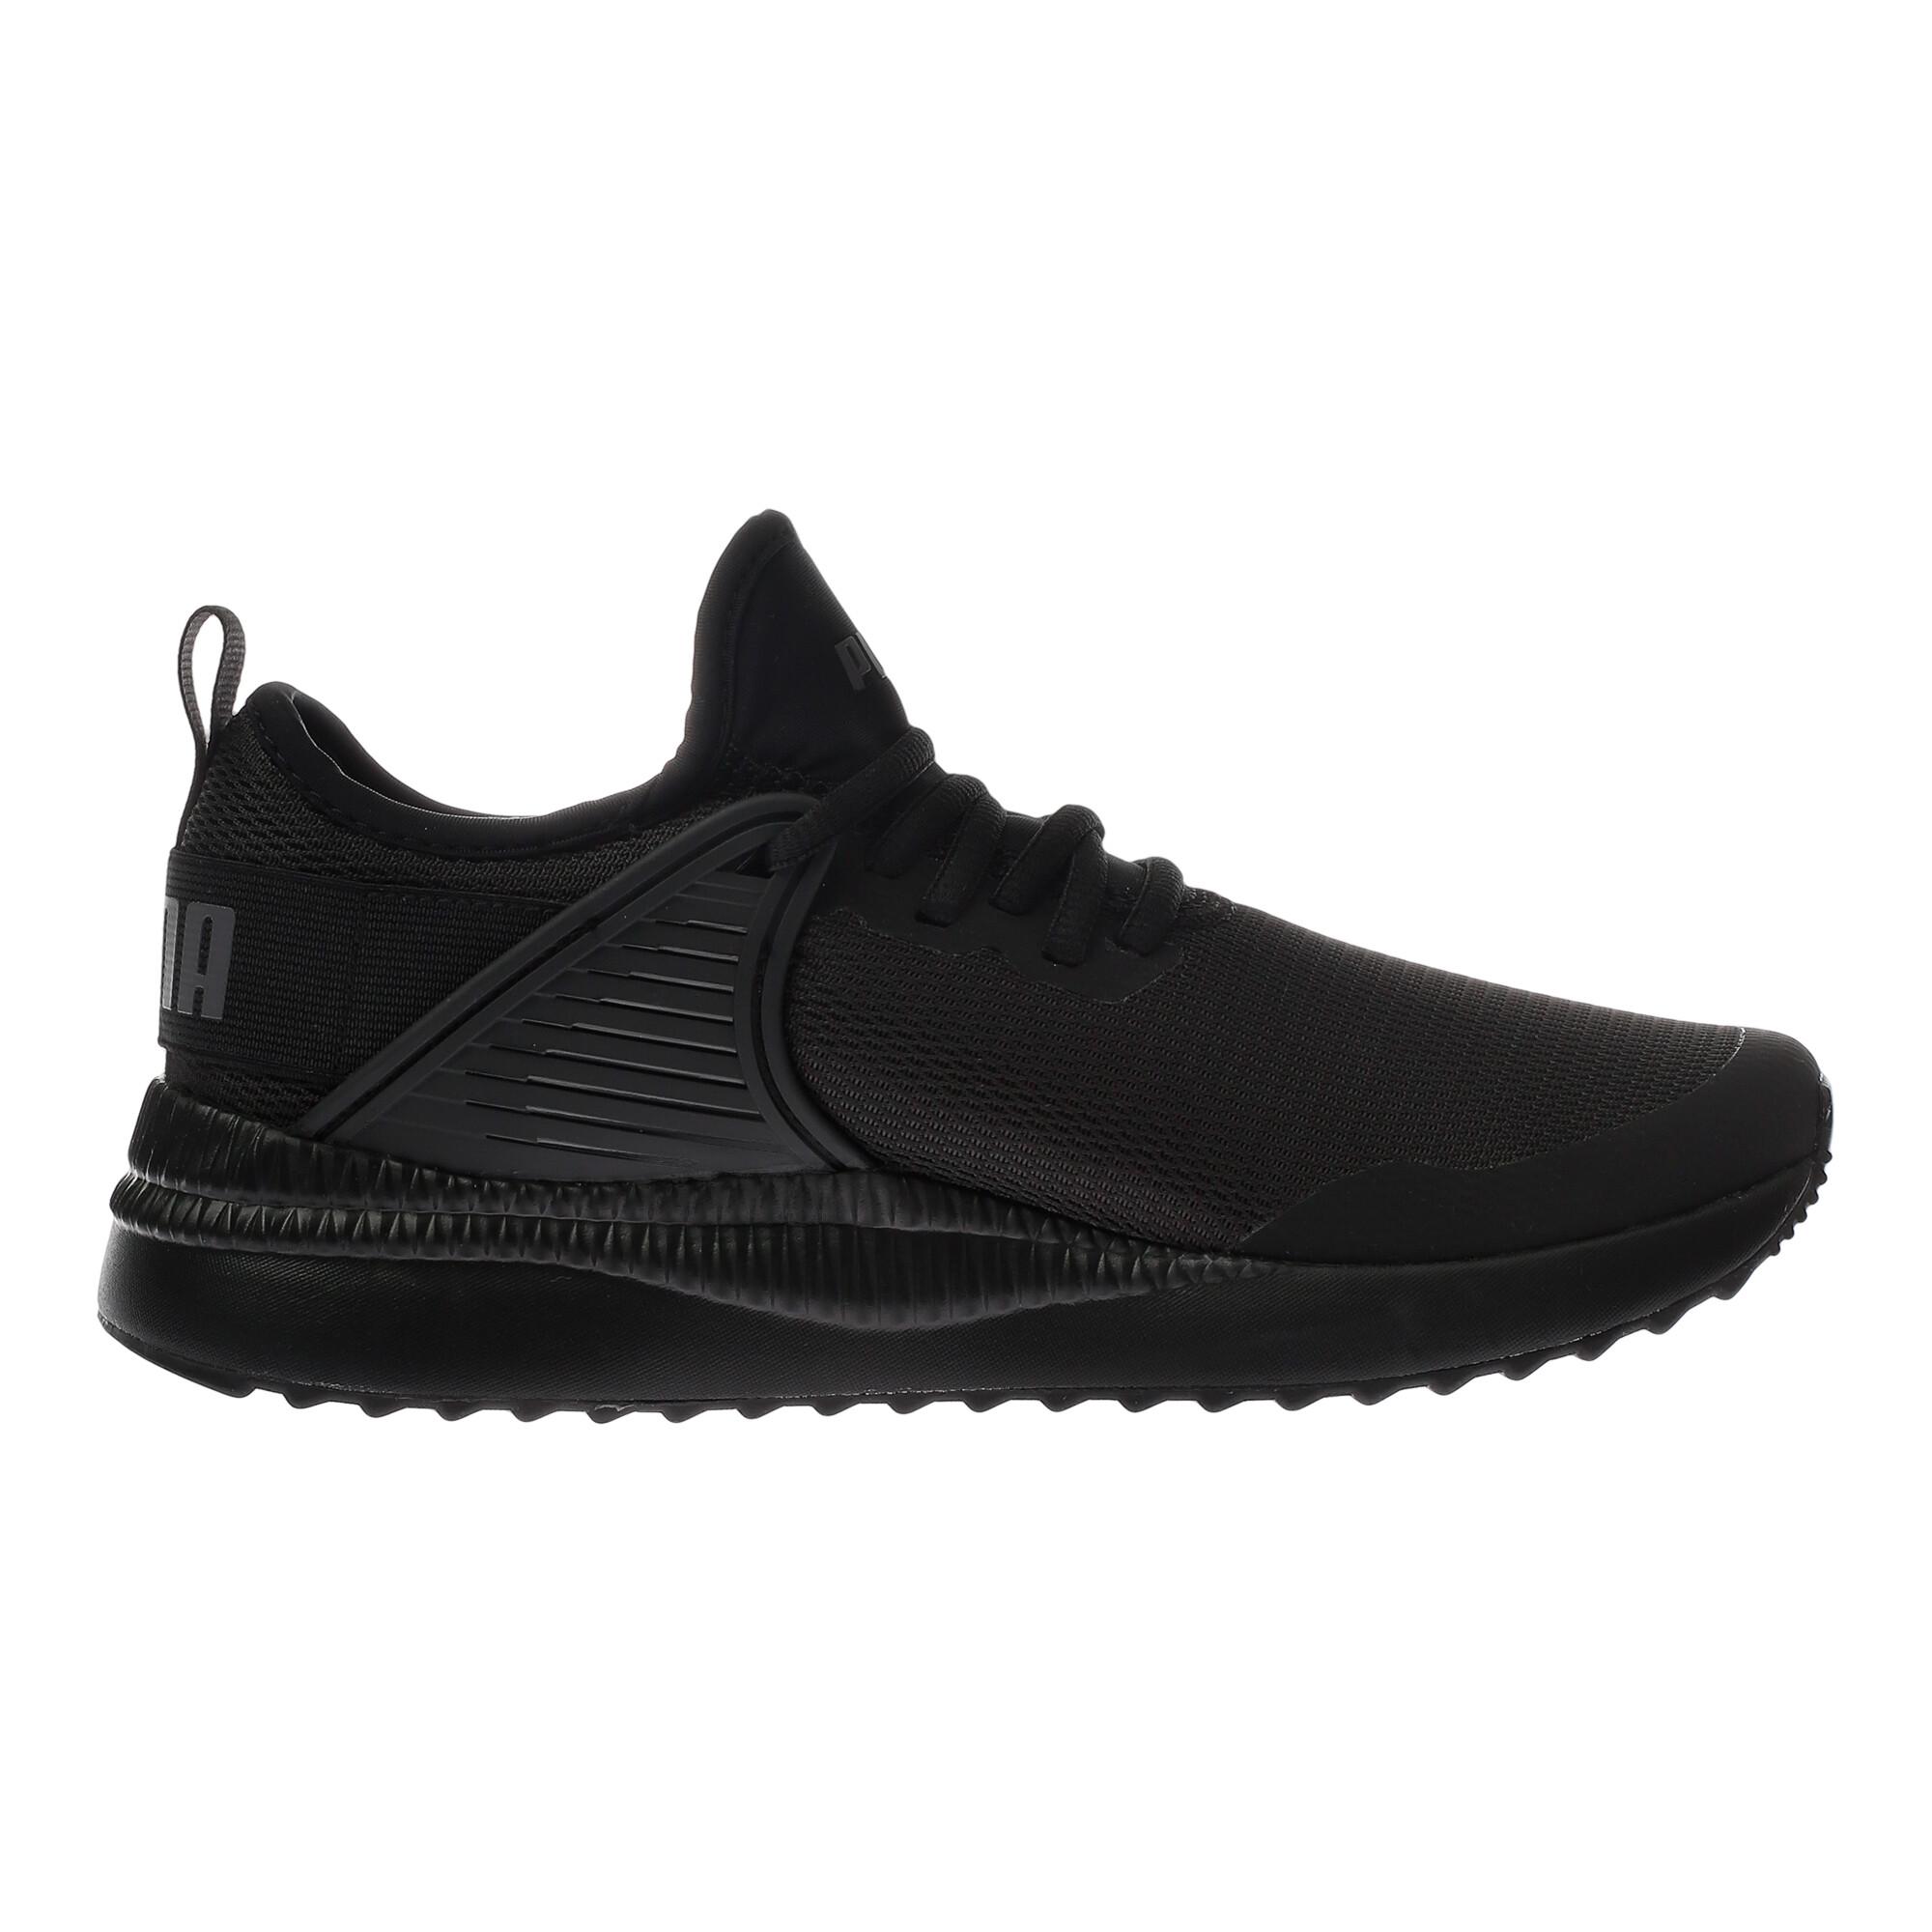 PUMA-Pacer-Next-Cage-Sneakers-JR-Boys-Shoe-Kids thumbnail 5